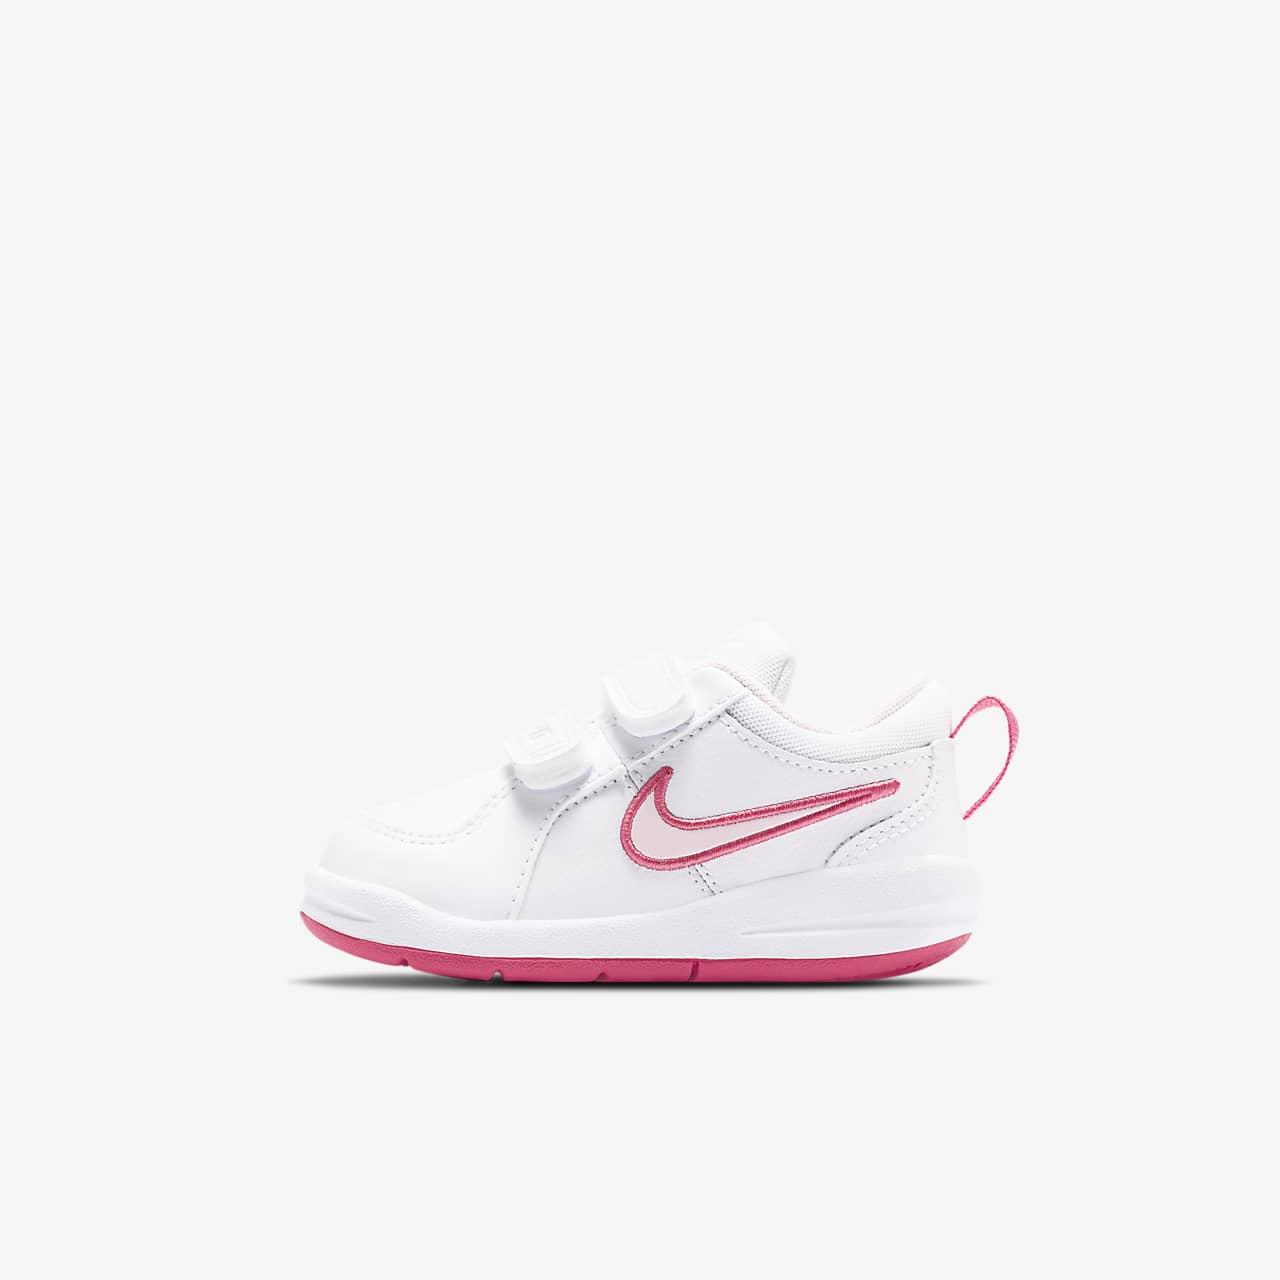 Scarpa Nike Pico 4 - Neonata Bimba piccola (17-27). Nike.com IT 20537b99d64